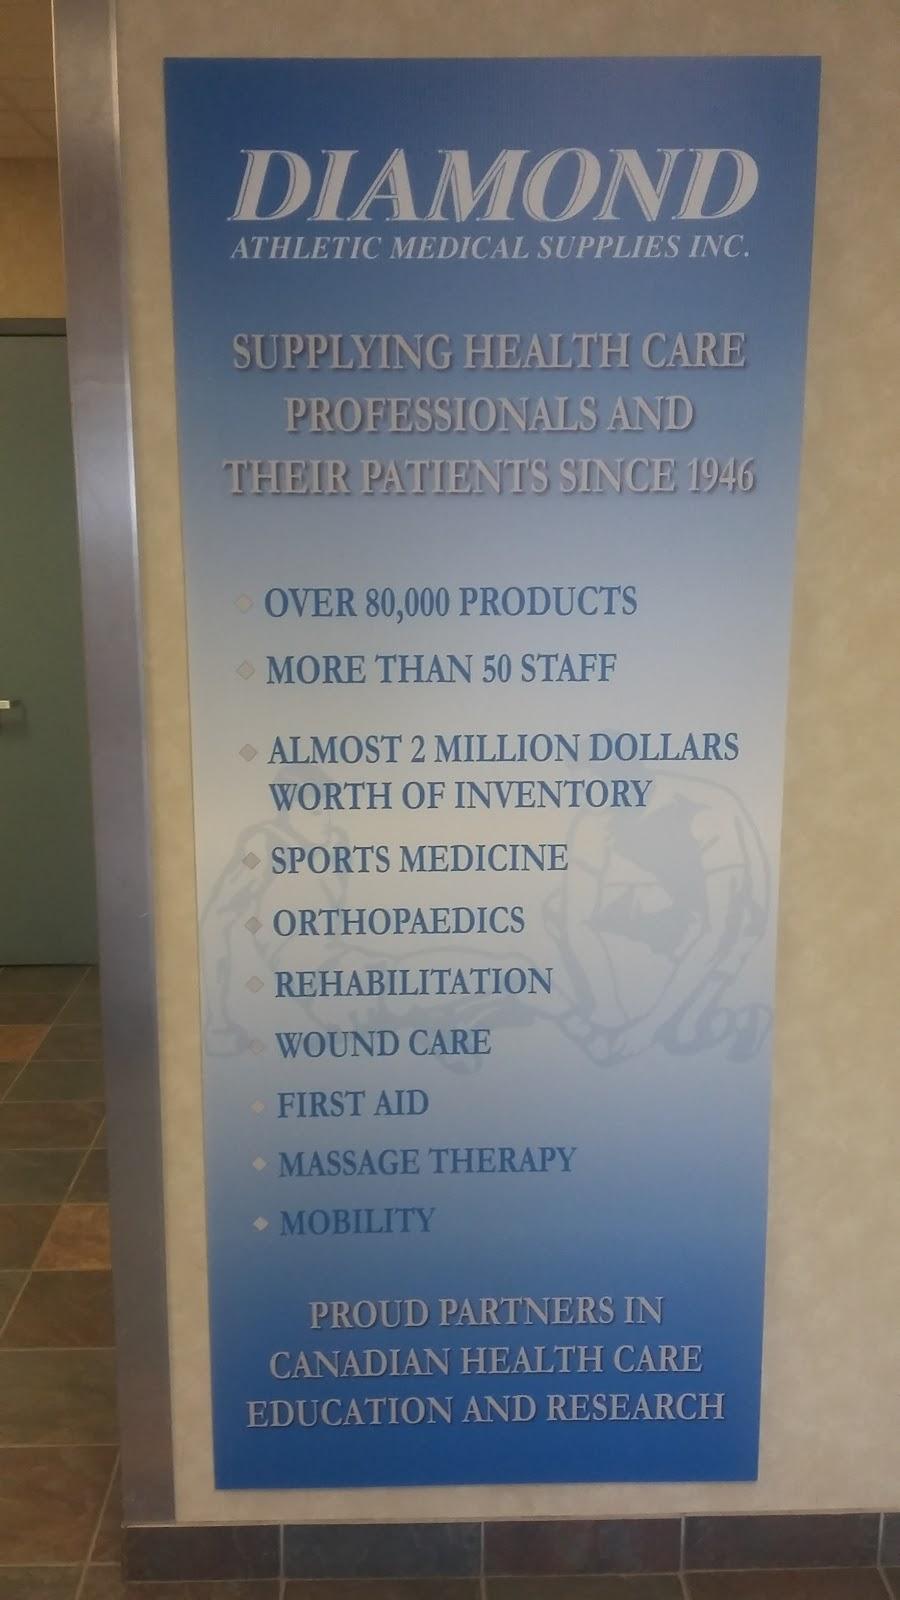 Diamond Athletic Medical Supplies Inc | health | 75 Poseidon Bay, Winnipeg, MB R3M 3E4, Canada | 2044887820 OR +1 204-488-7820